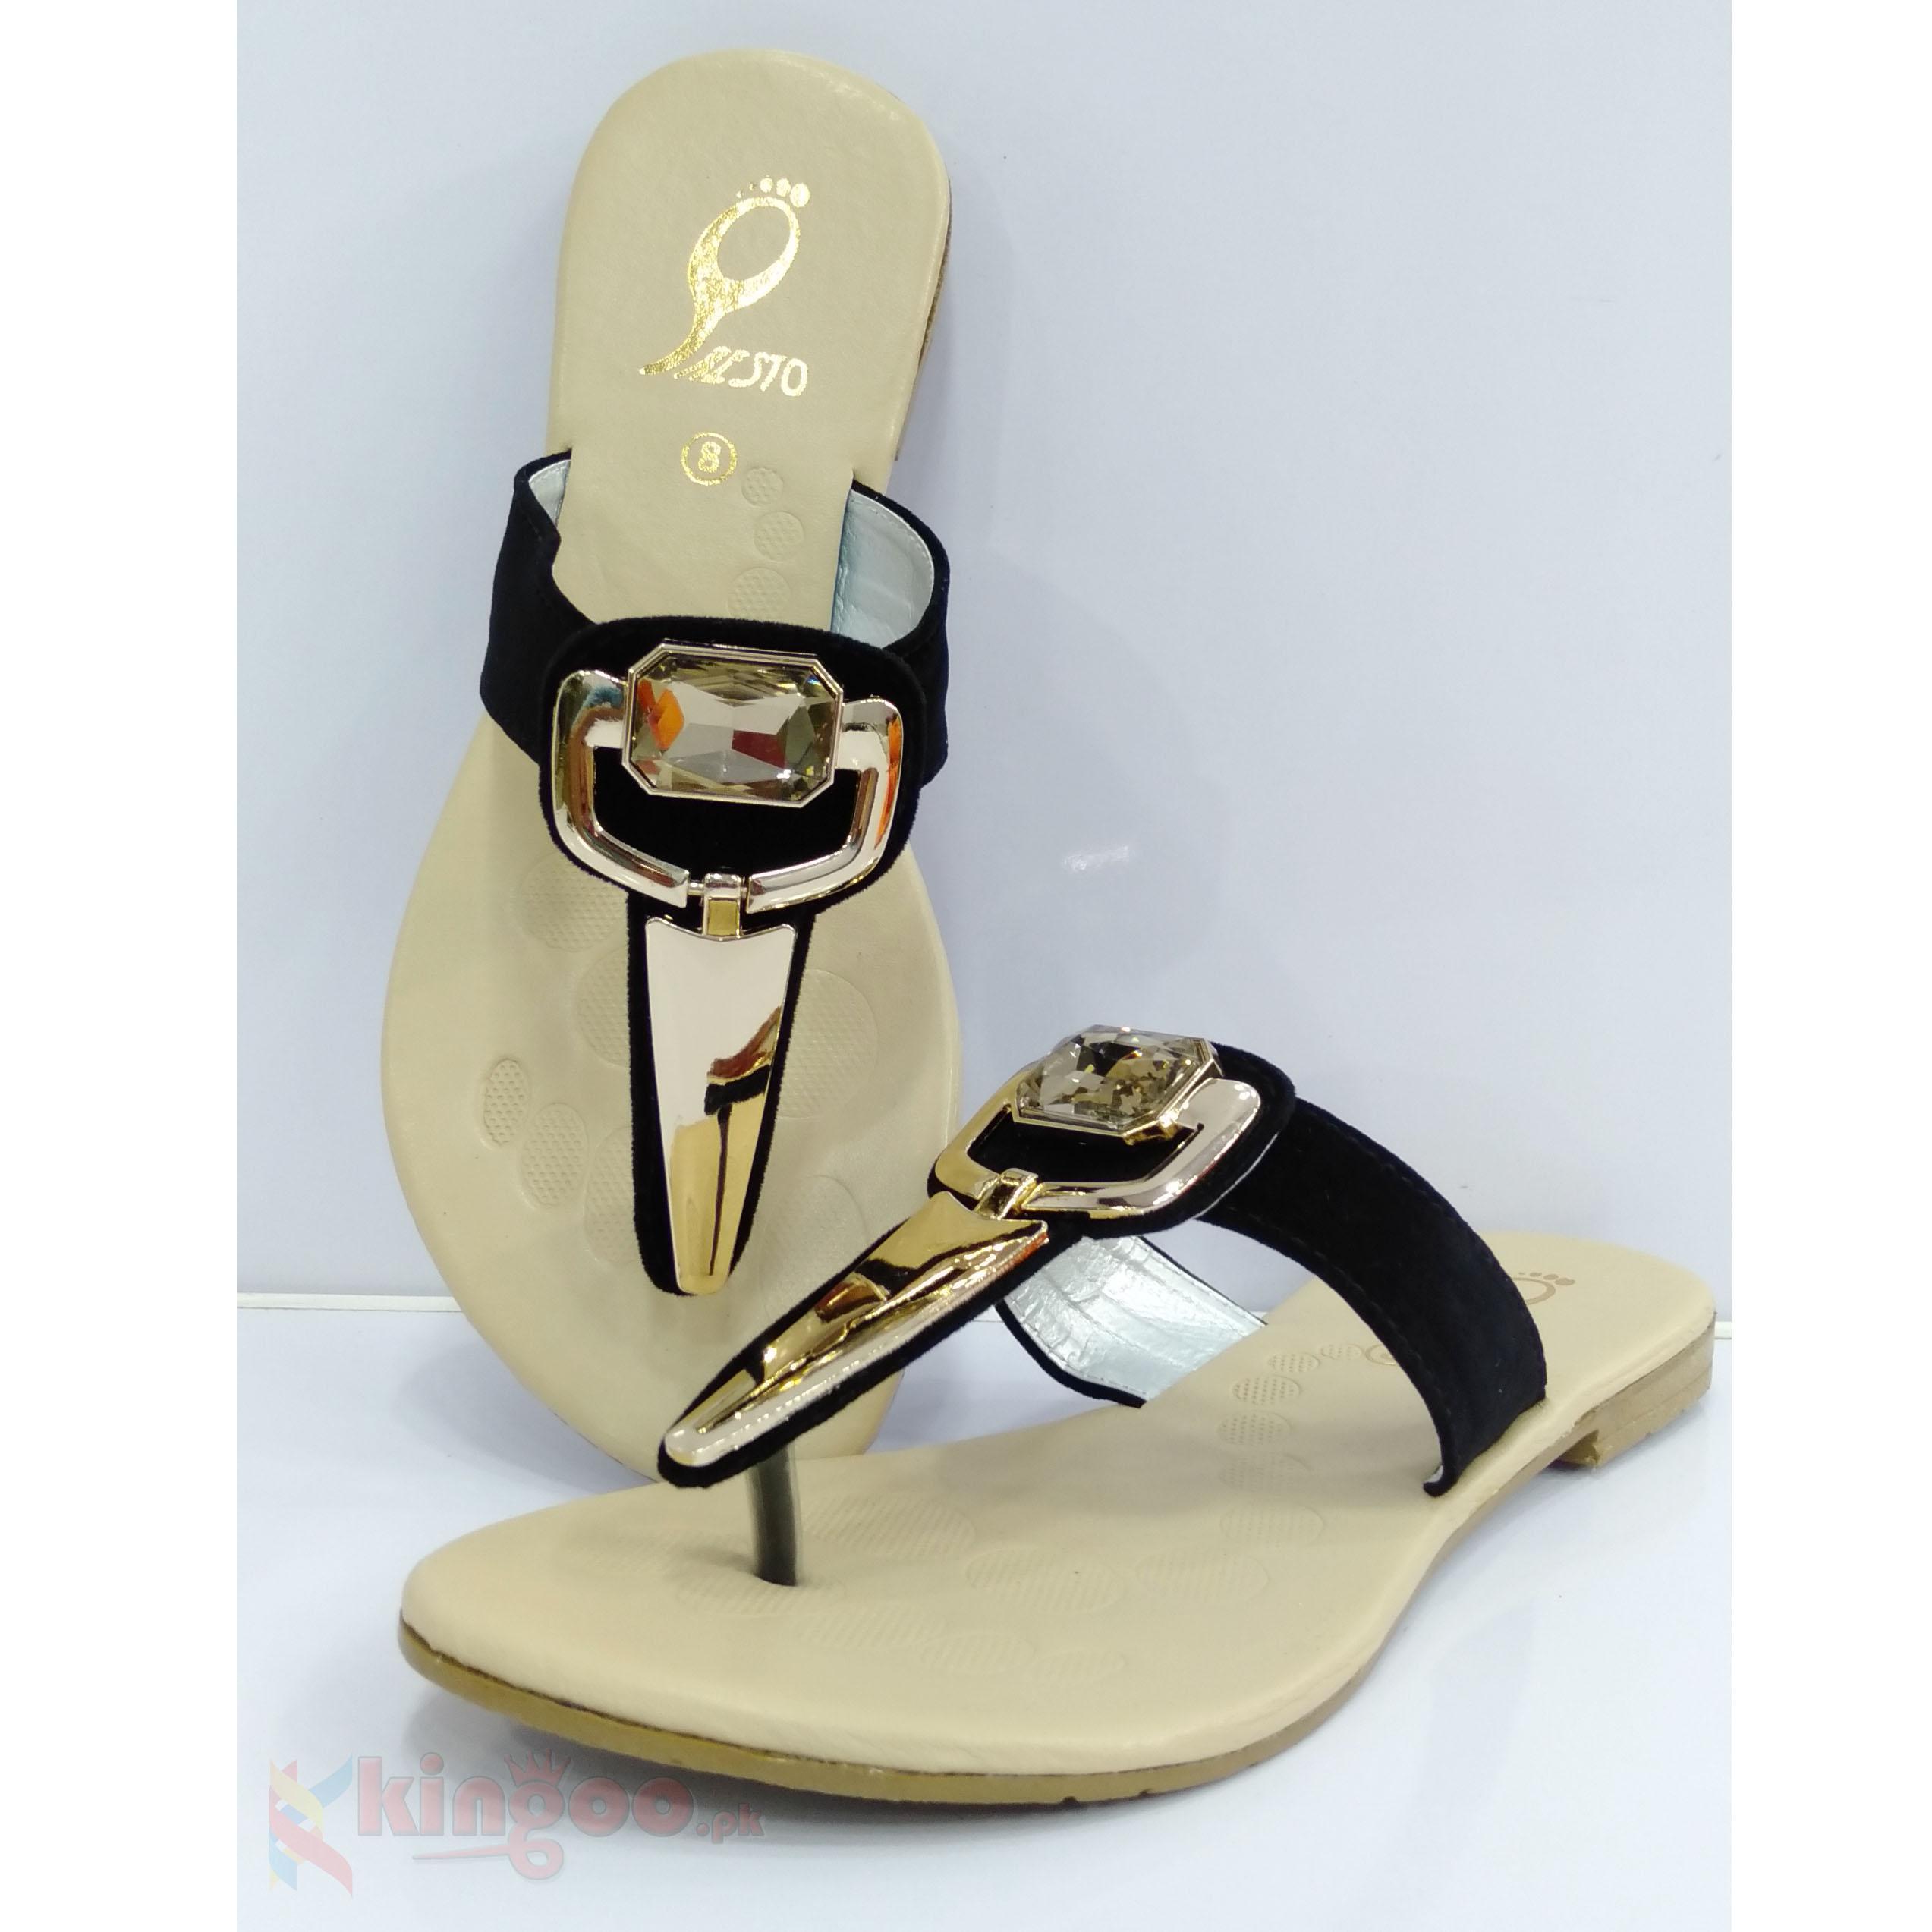 5cc4b6da0 Women s Flip-Flops Online in Pakistan - Daraz.pk